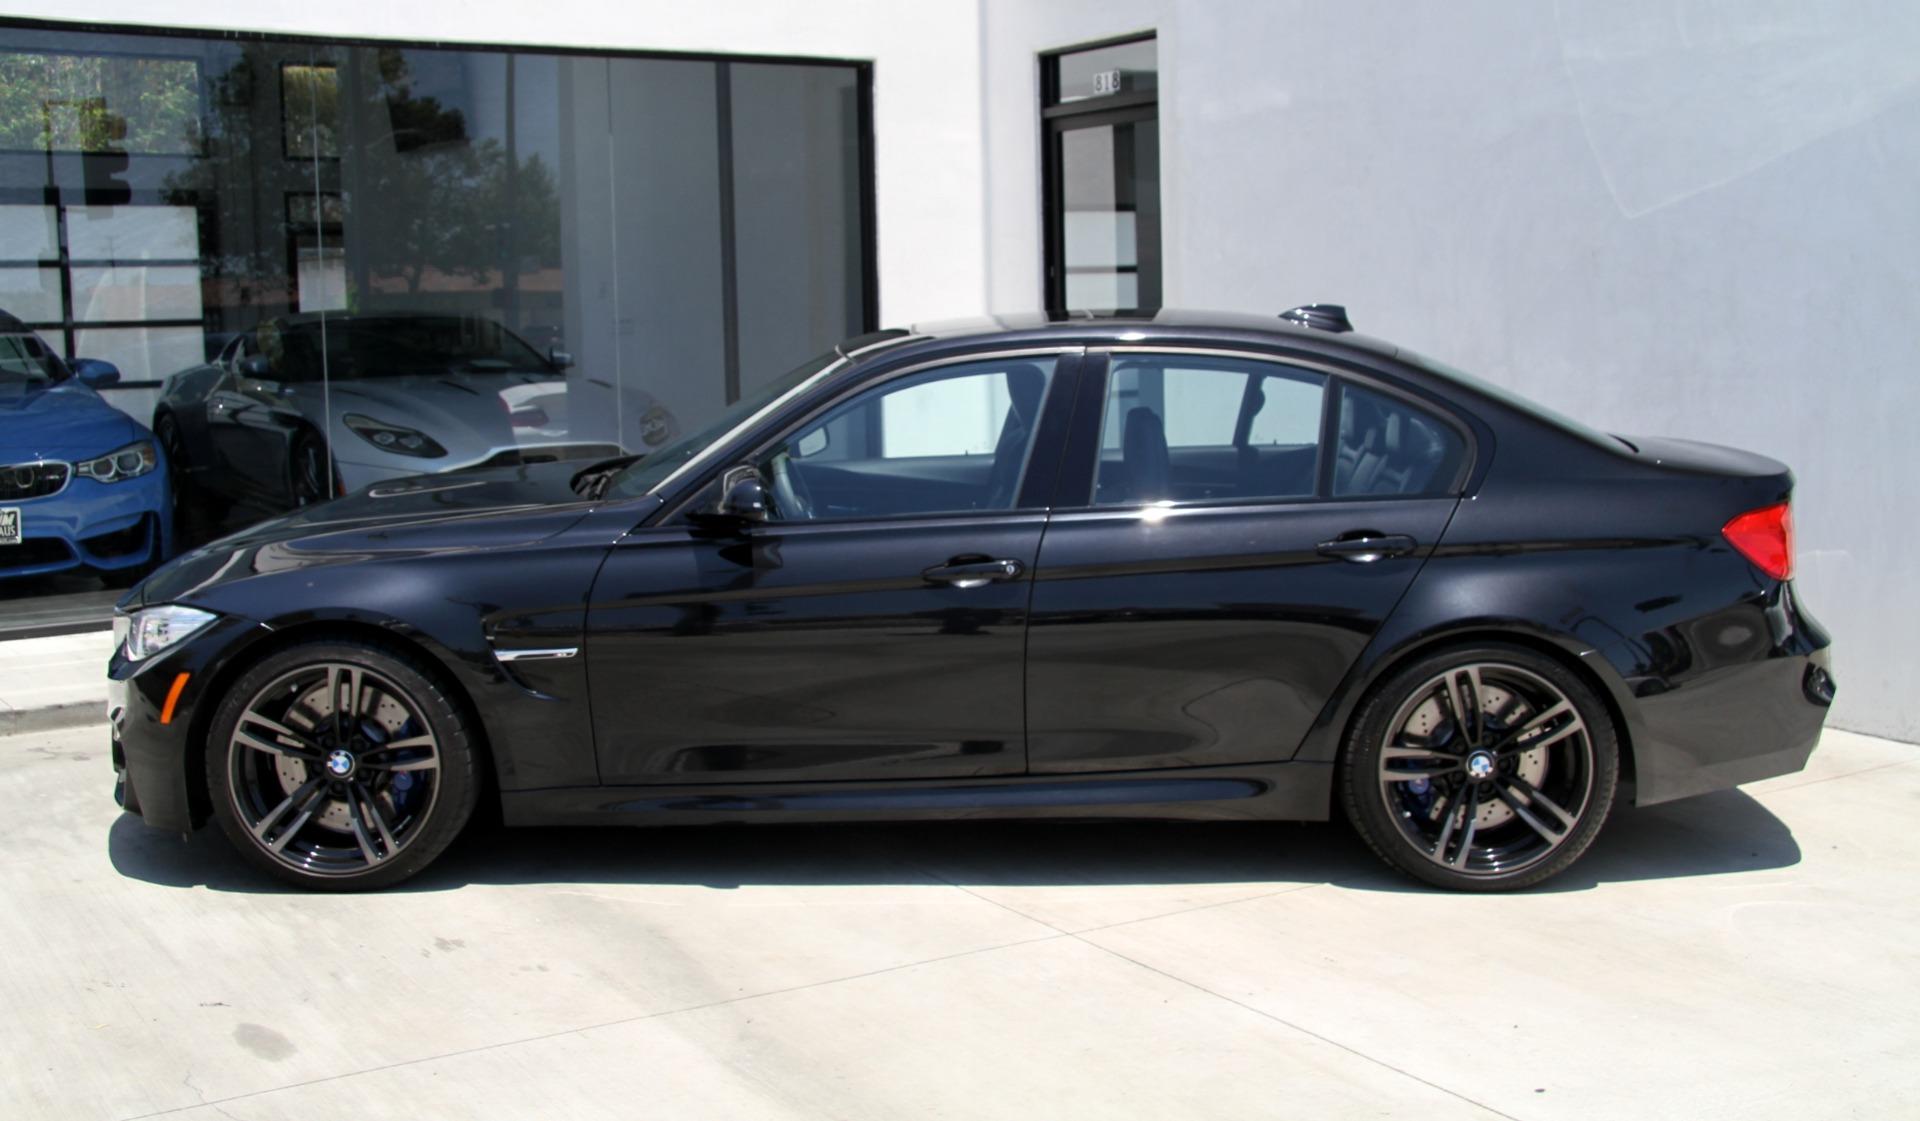 Used BMW For Sale Near Me >> 2015 BMW M3 Stock # 6231 for sale near Redondo Beach, CA ...